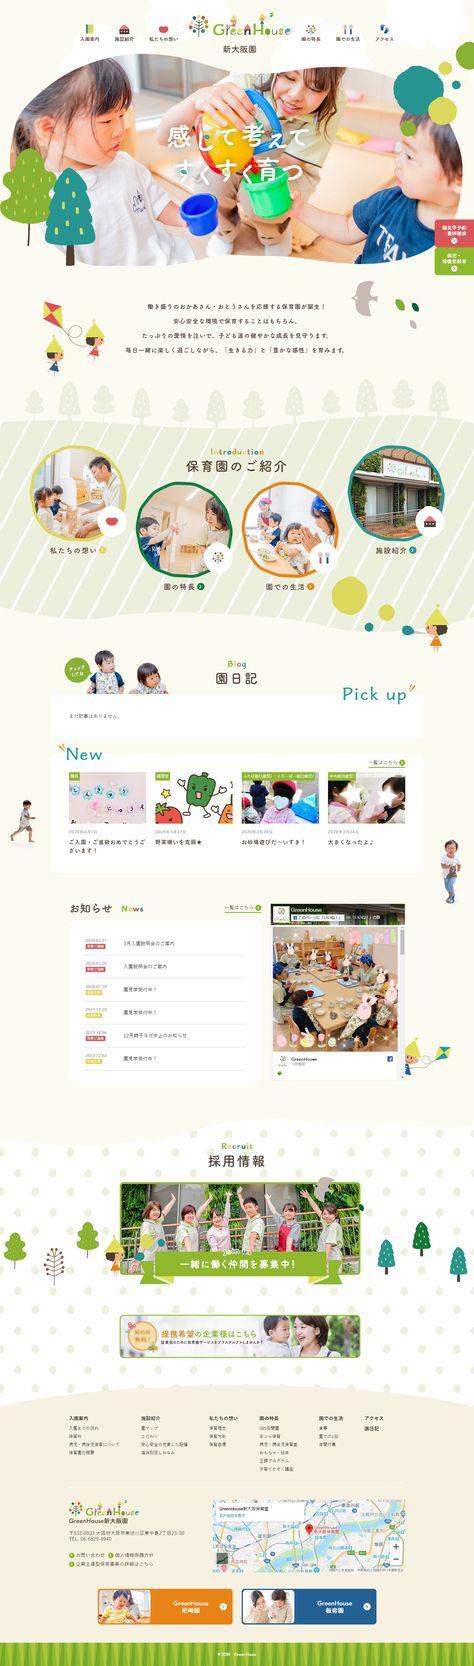 GreenHouse新大阪園(グリーンハウス)|STEAM教育を実践する保育園